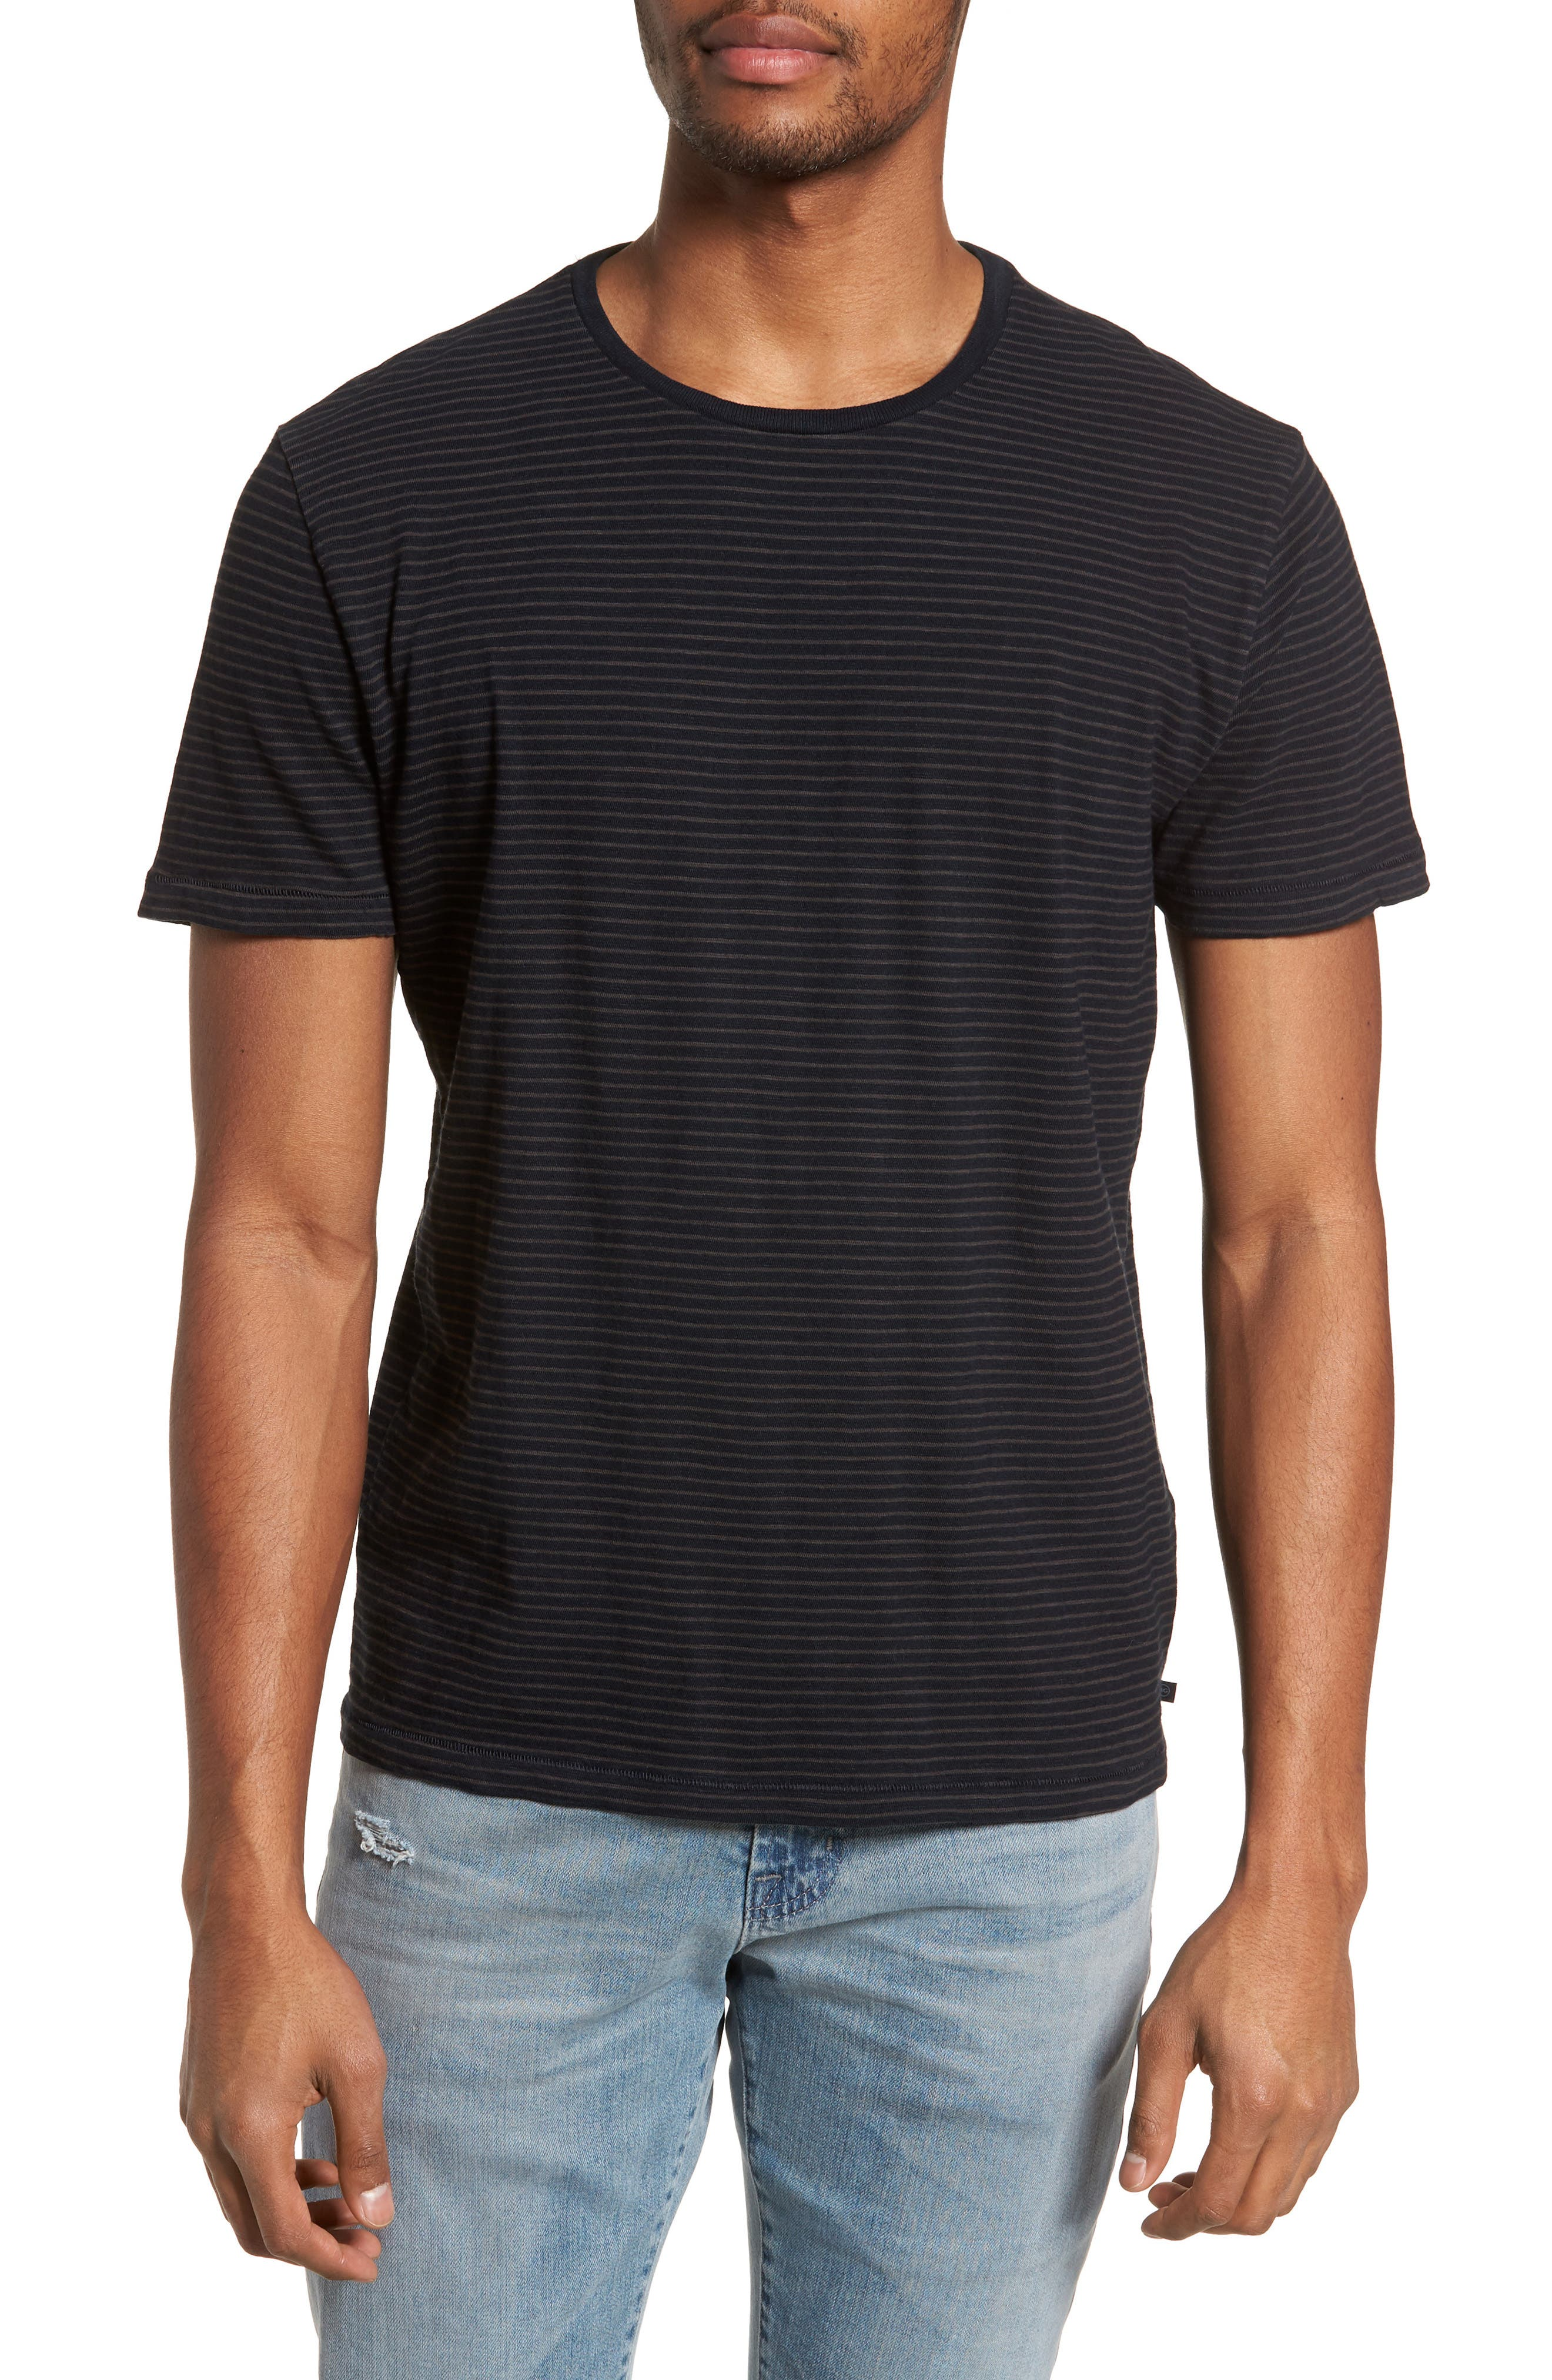 Julian Slim Fit Crewneck Shirt,                             Main thumbnail 1, color,